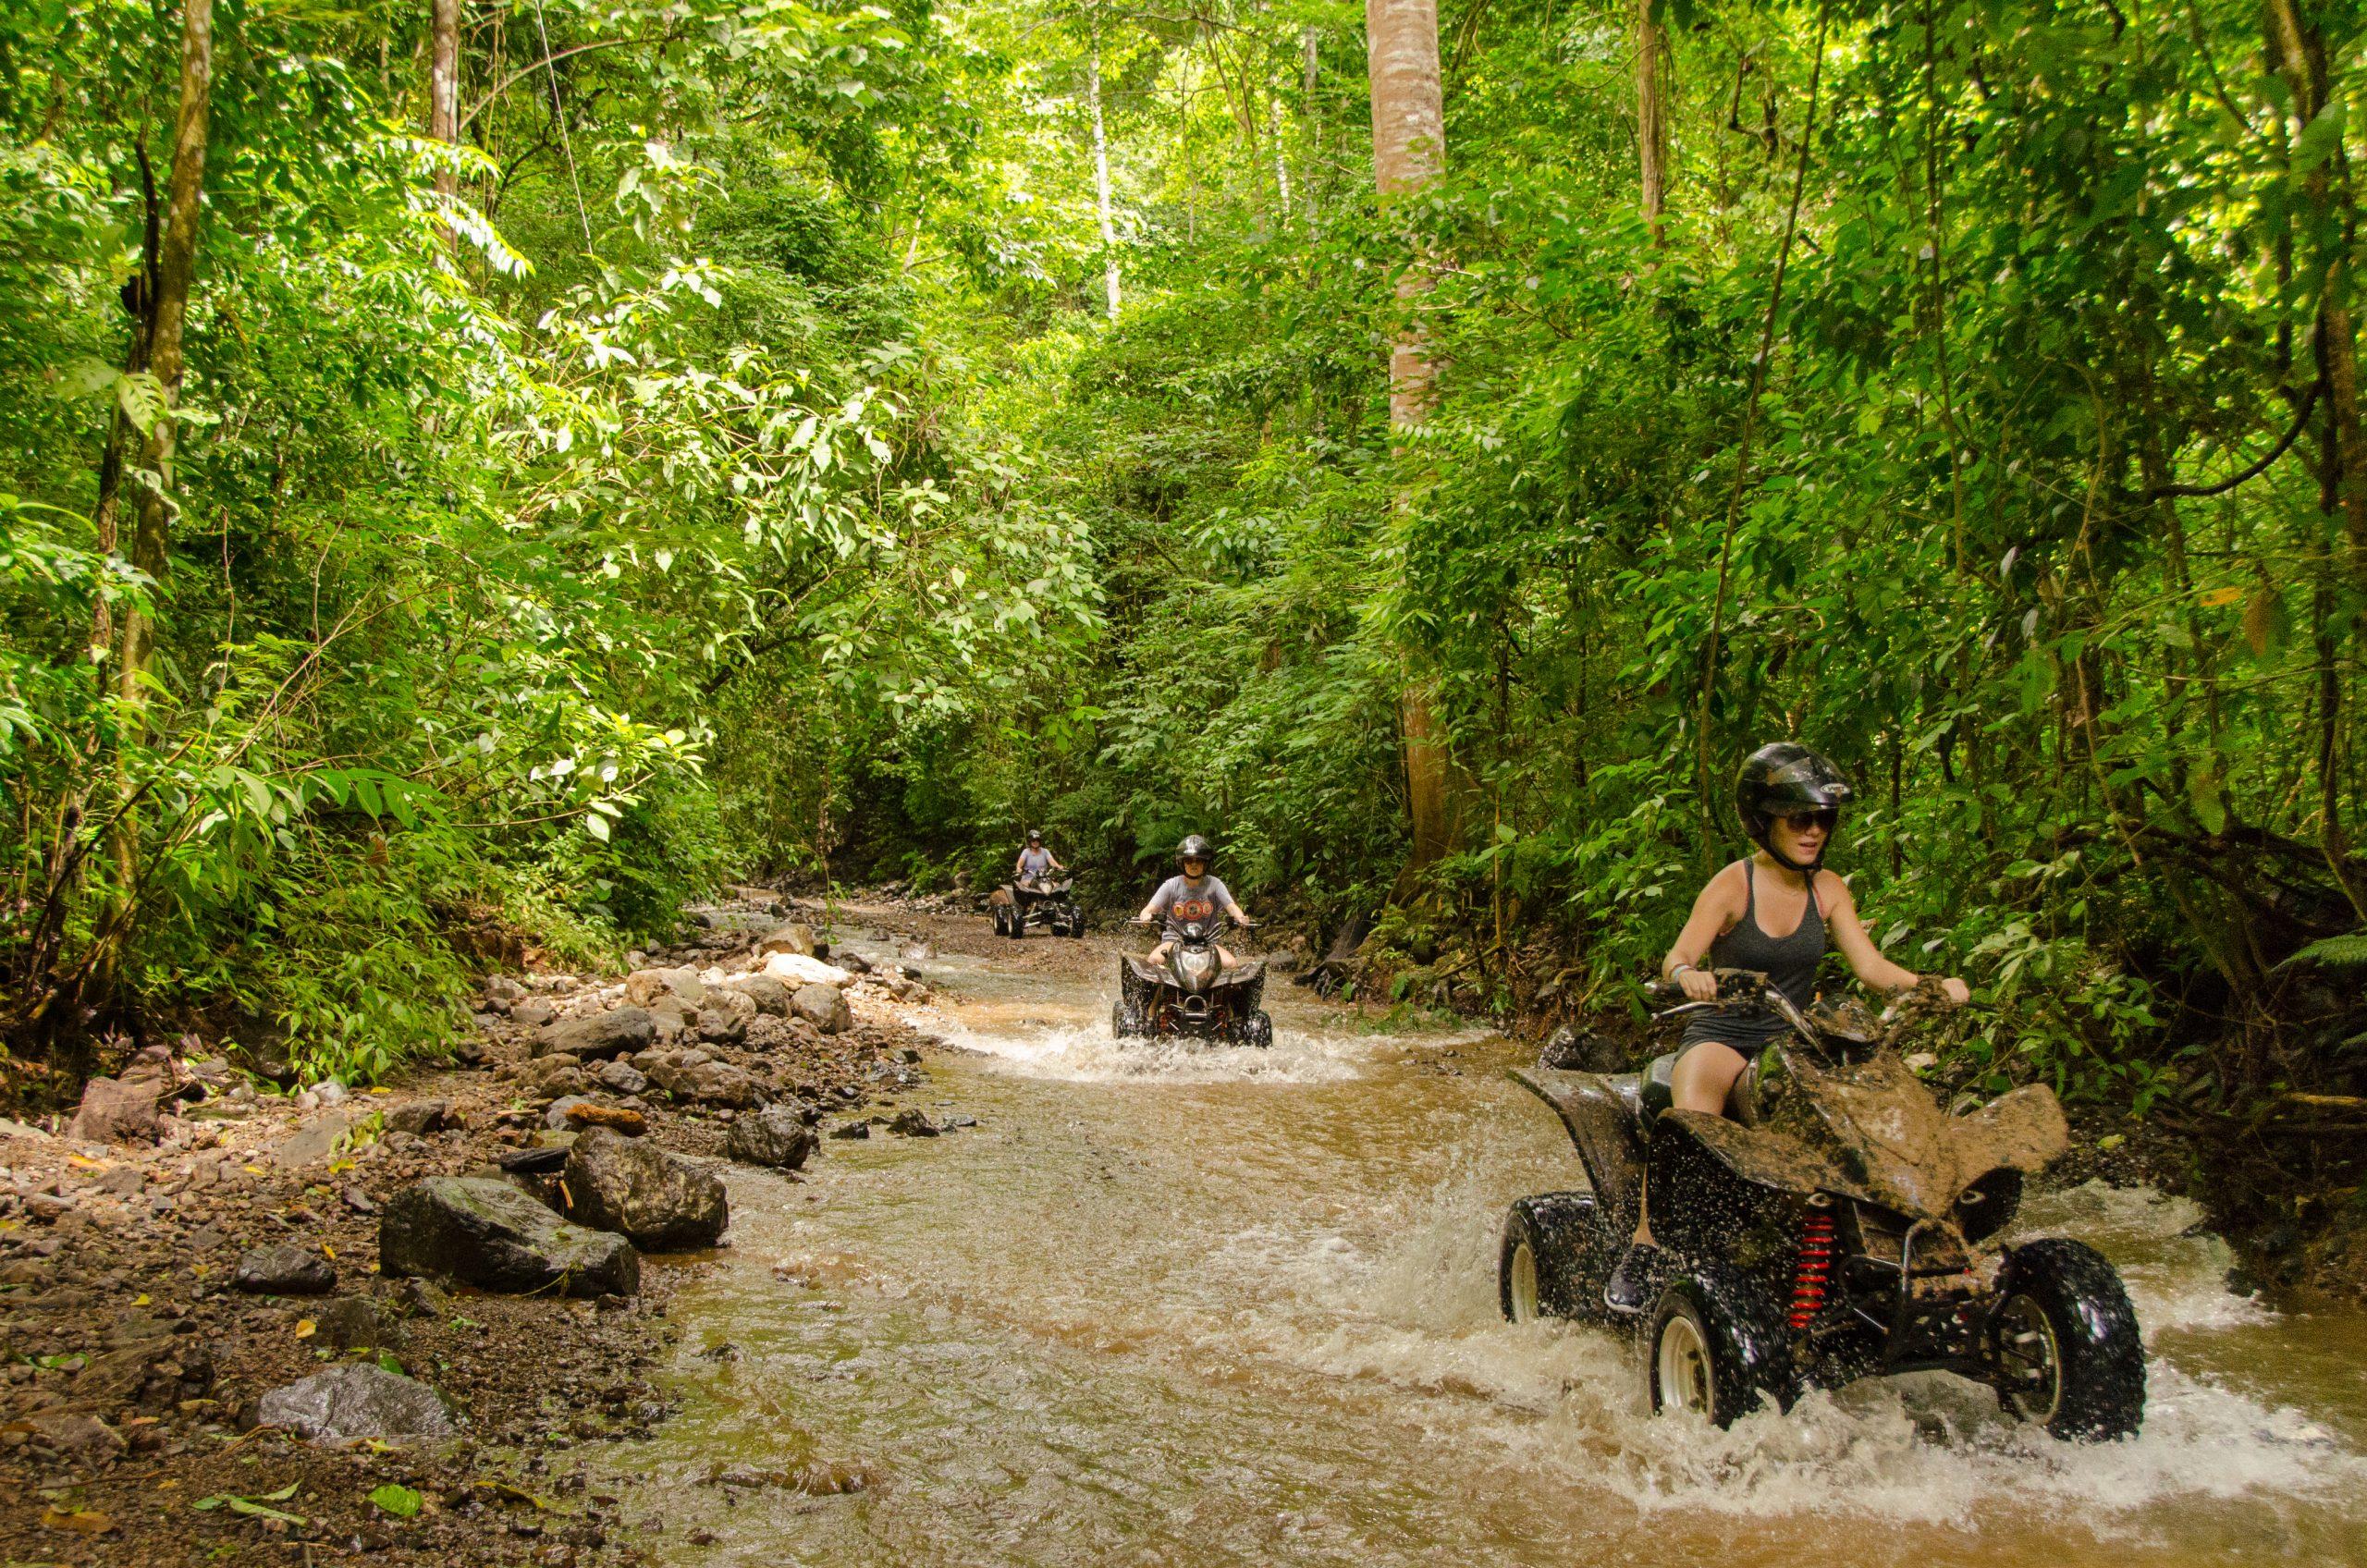 Atv Ride At The Full Day Nature Adventure At Vista Los Suenos_36